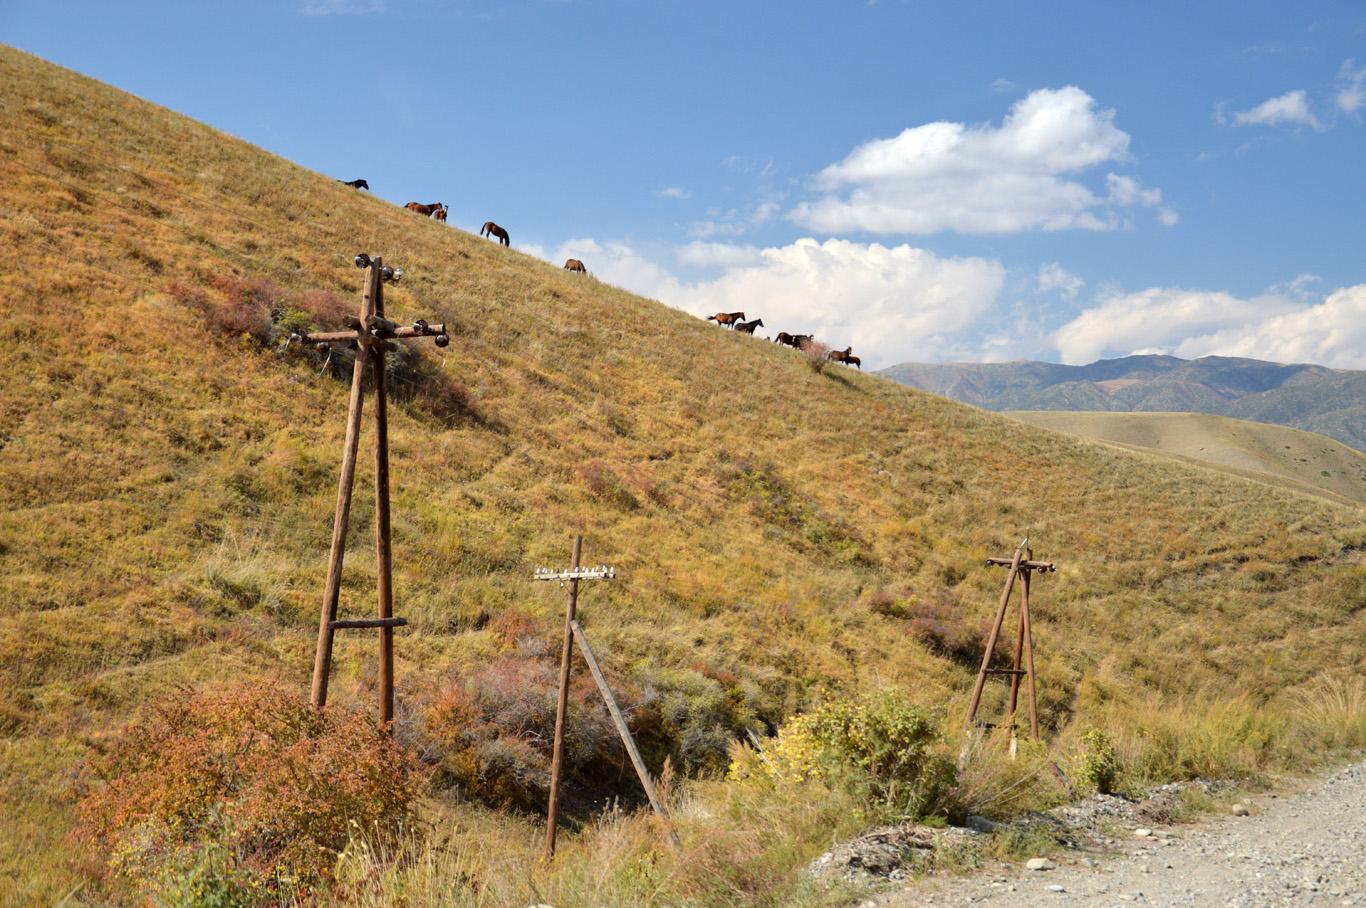 Common sight in Kazakhstan - horses grazing